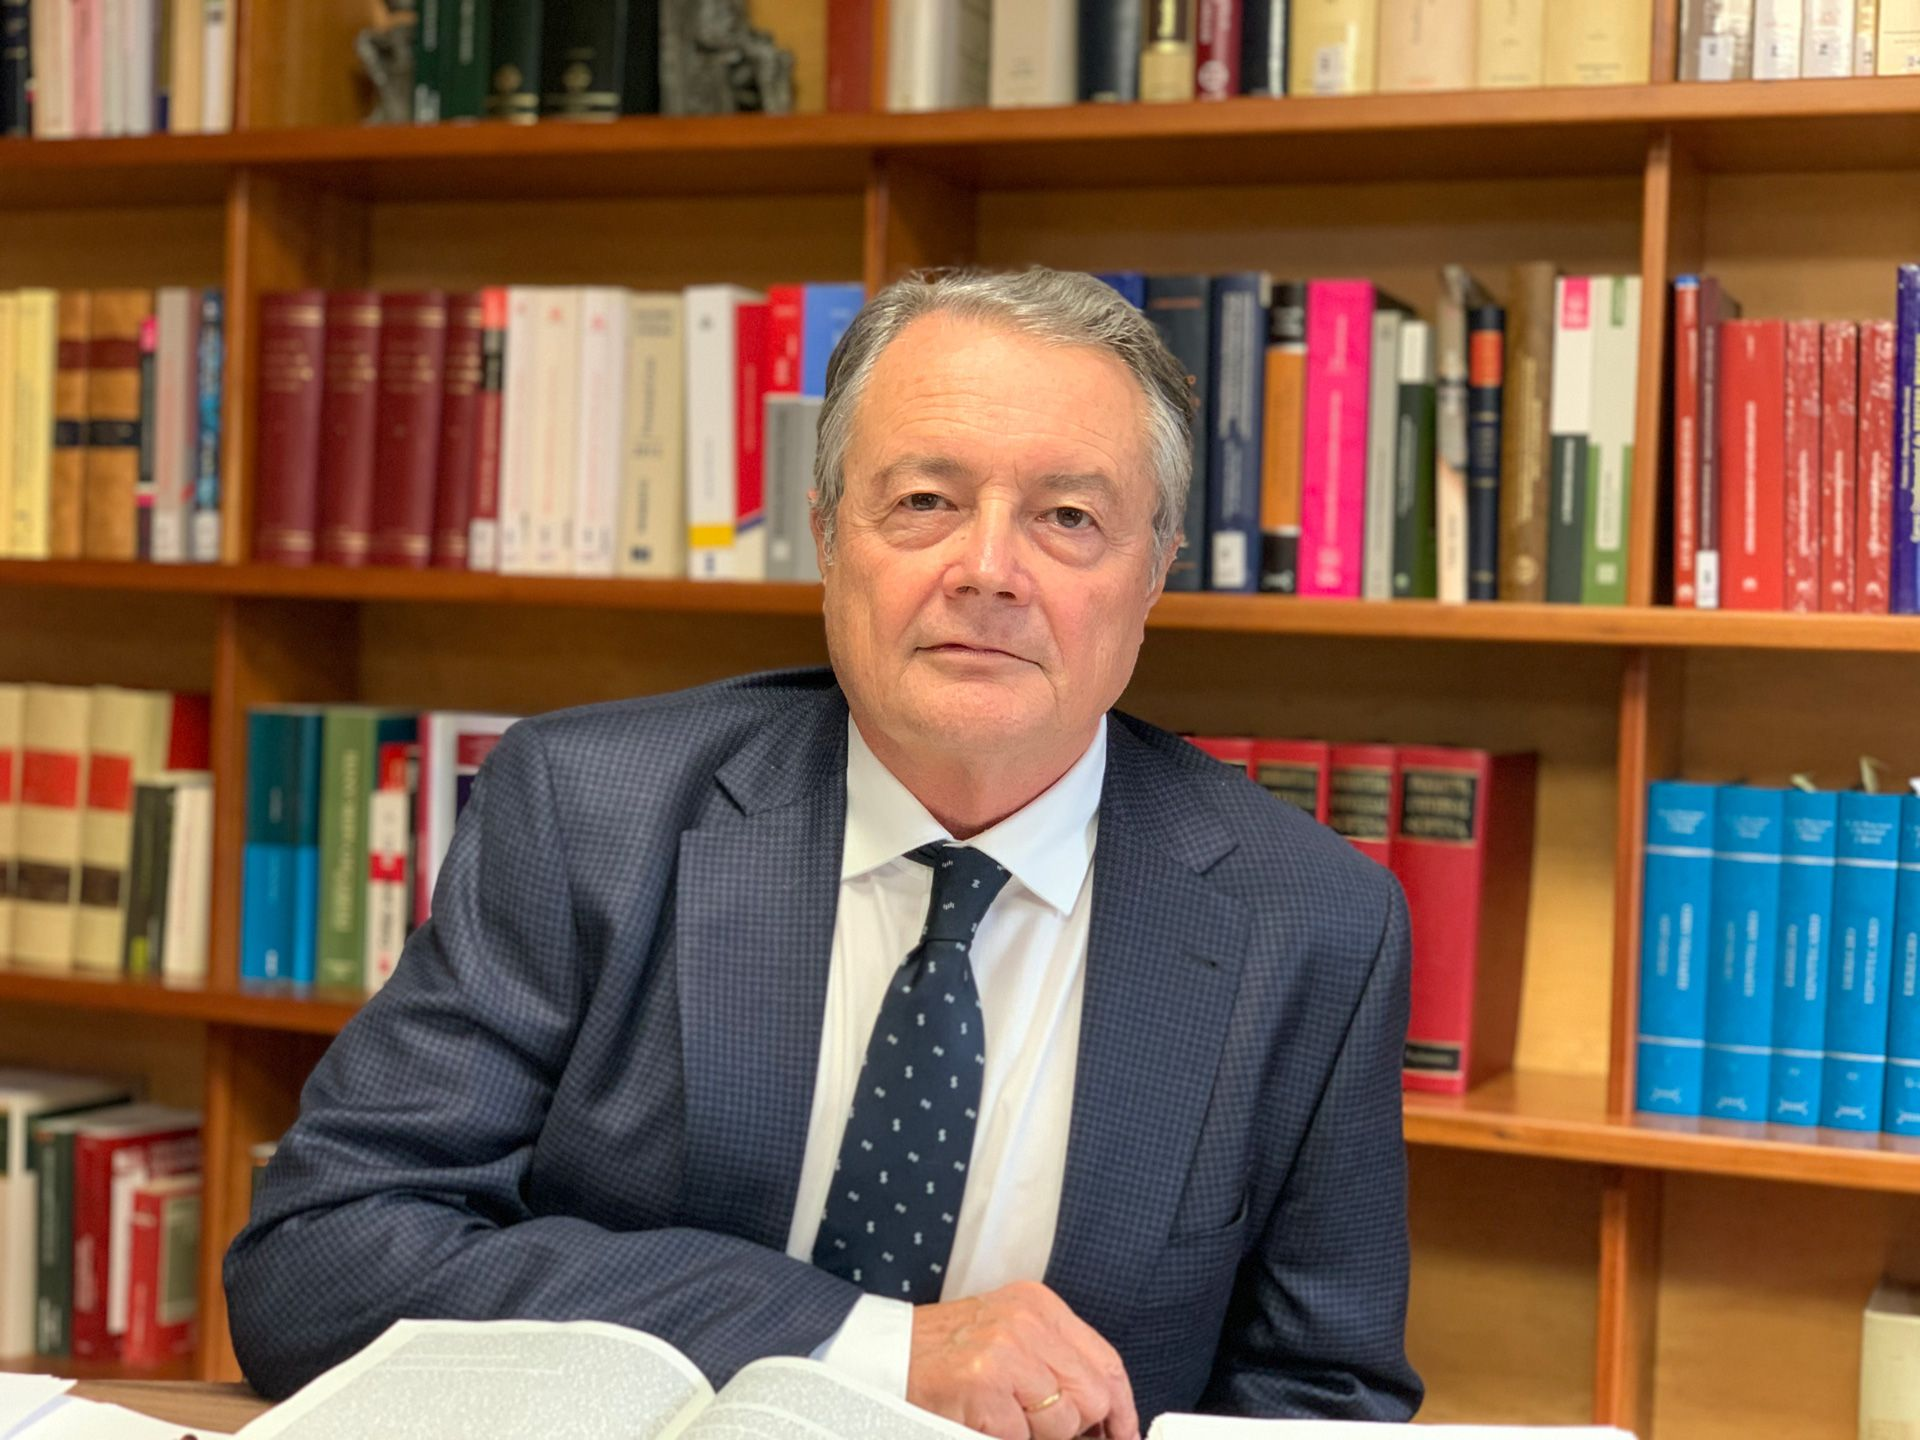 Antonio Salas Carceller, ex magistrado del Tribunal Supremo, consultor externo de Ginés Riquelme Abogados